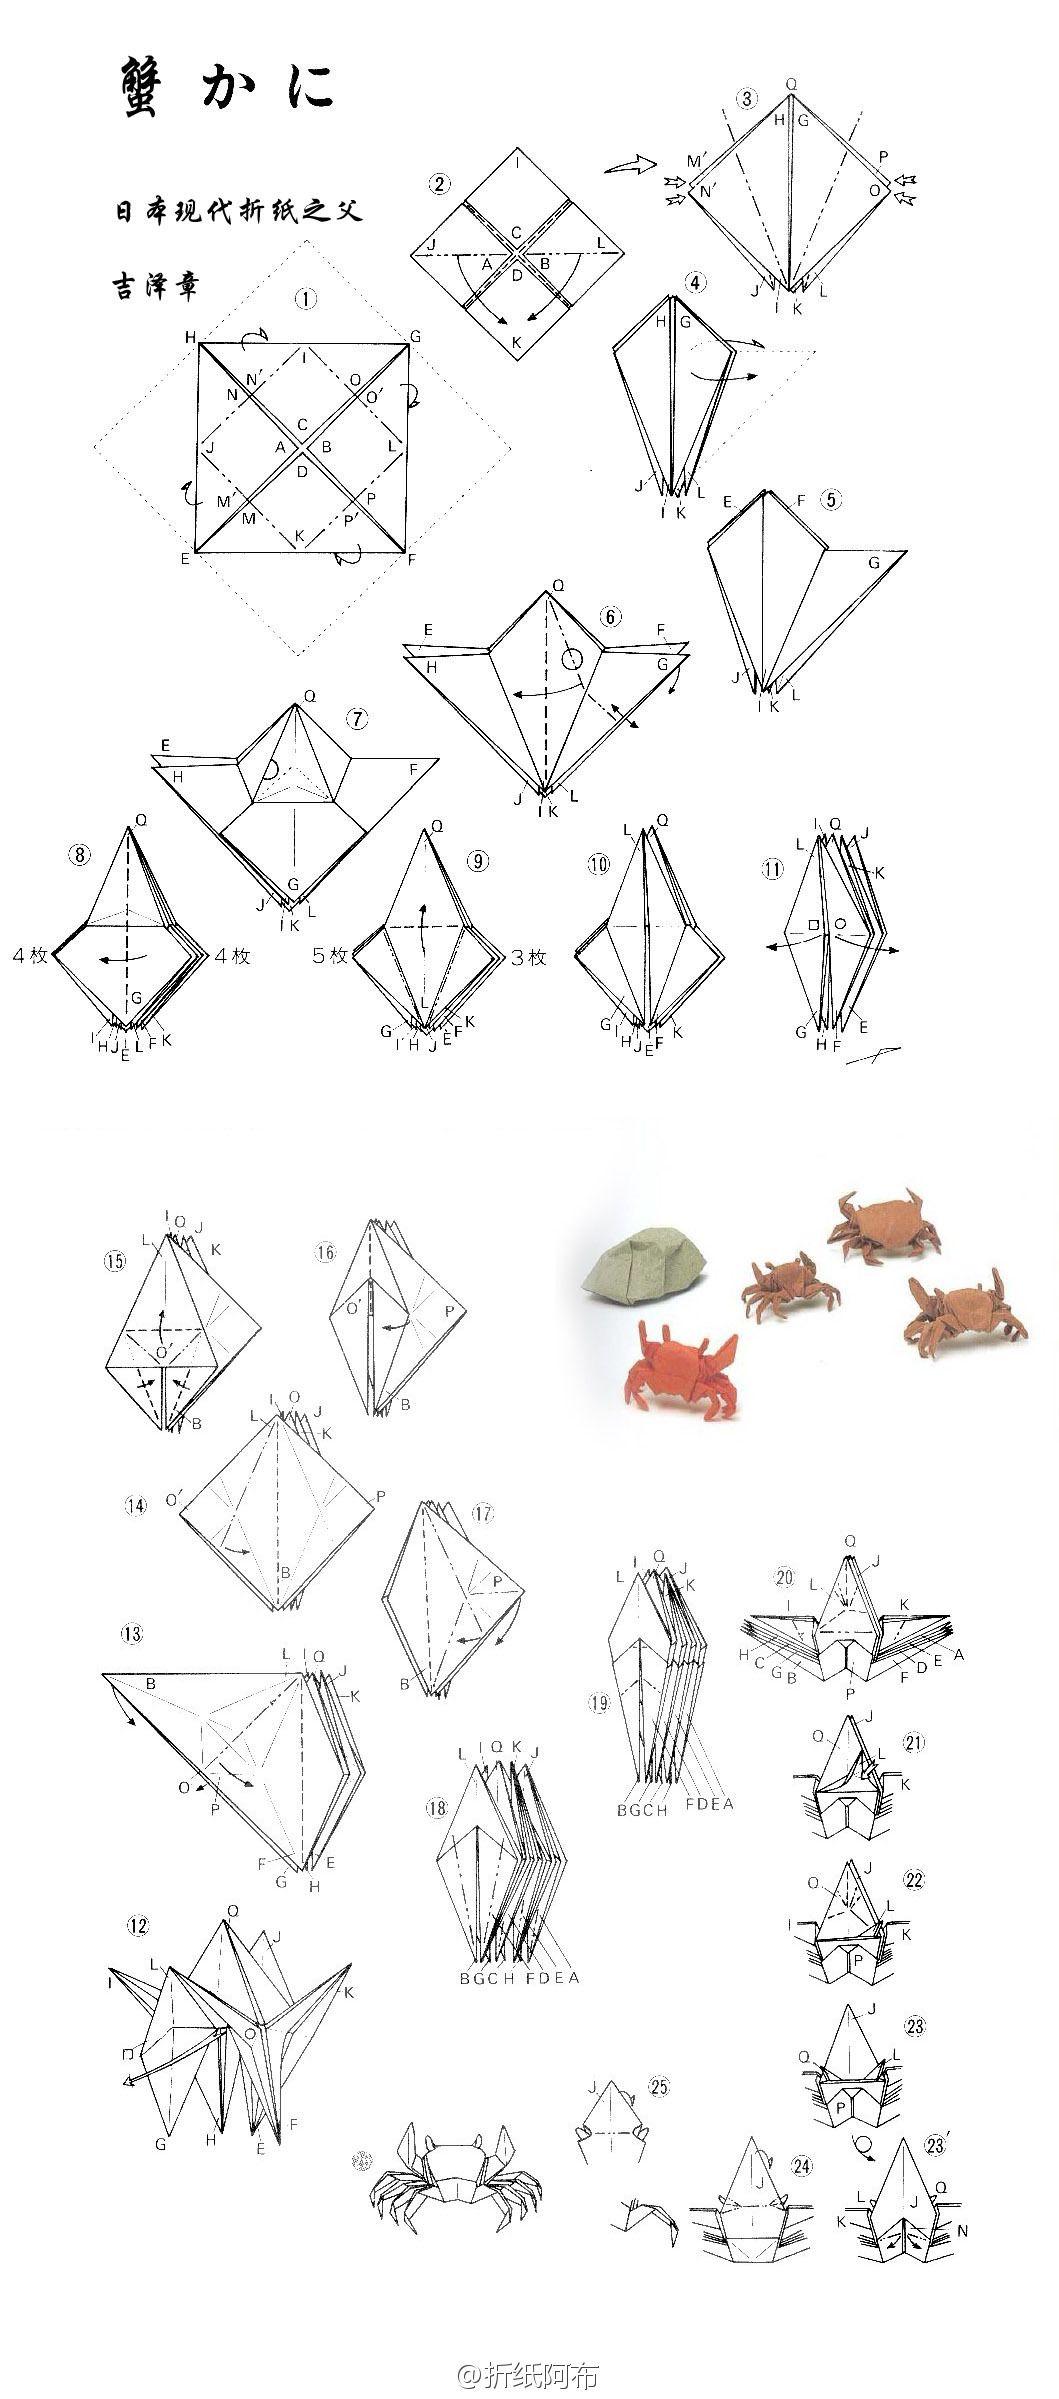 Origami cangrejo | origami | Pinterest | Papiroflexia, Origami y ...